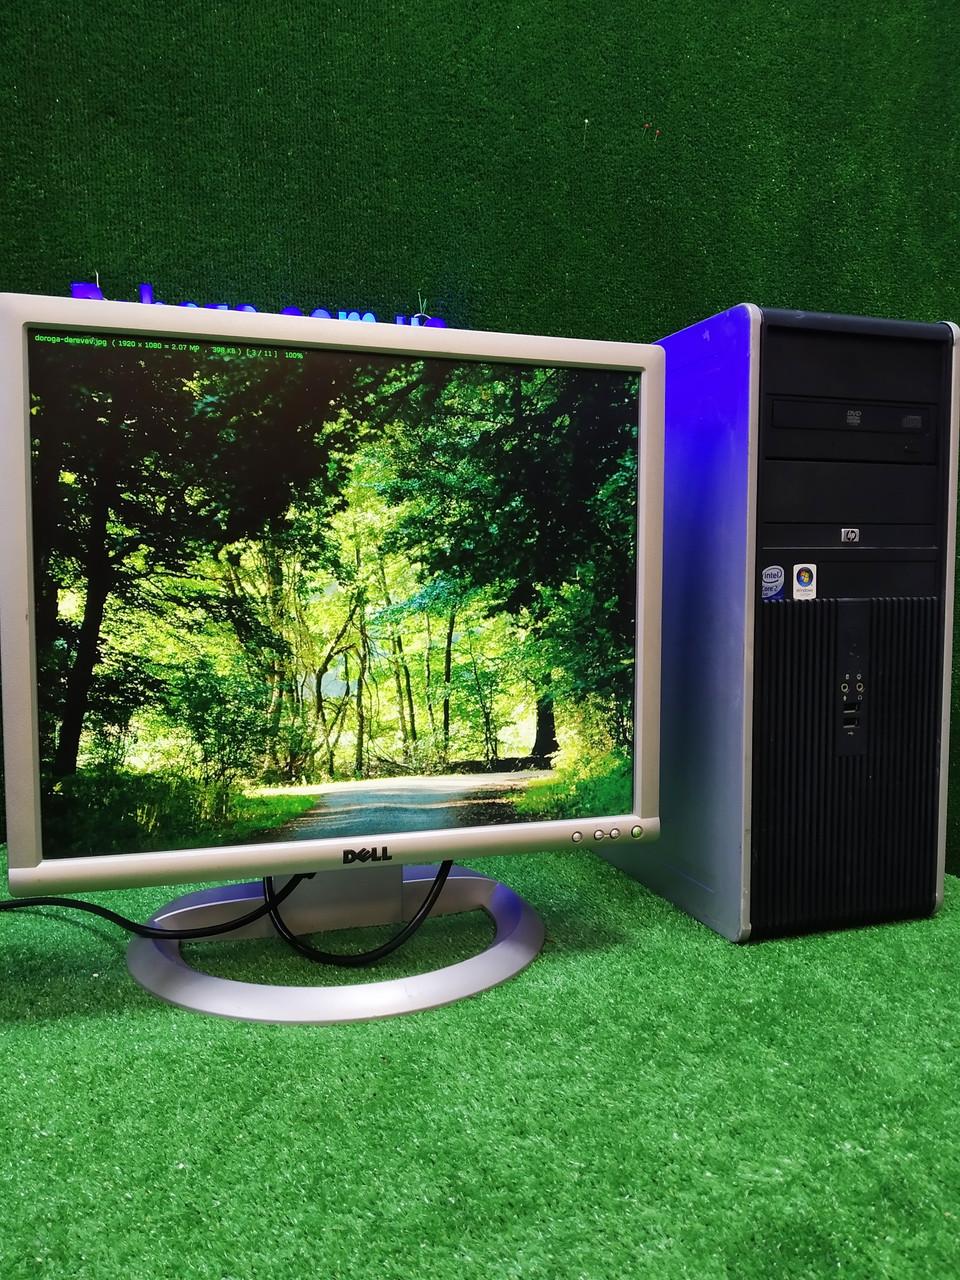 "Компьютер HP + монитор 19"" VA Dell, Intel  E7500 2.93Ггц, 4 ГБ, 160 ГБ Настроен! Есть Опт! Гарантия!"